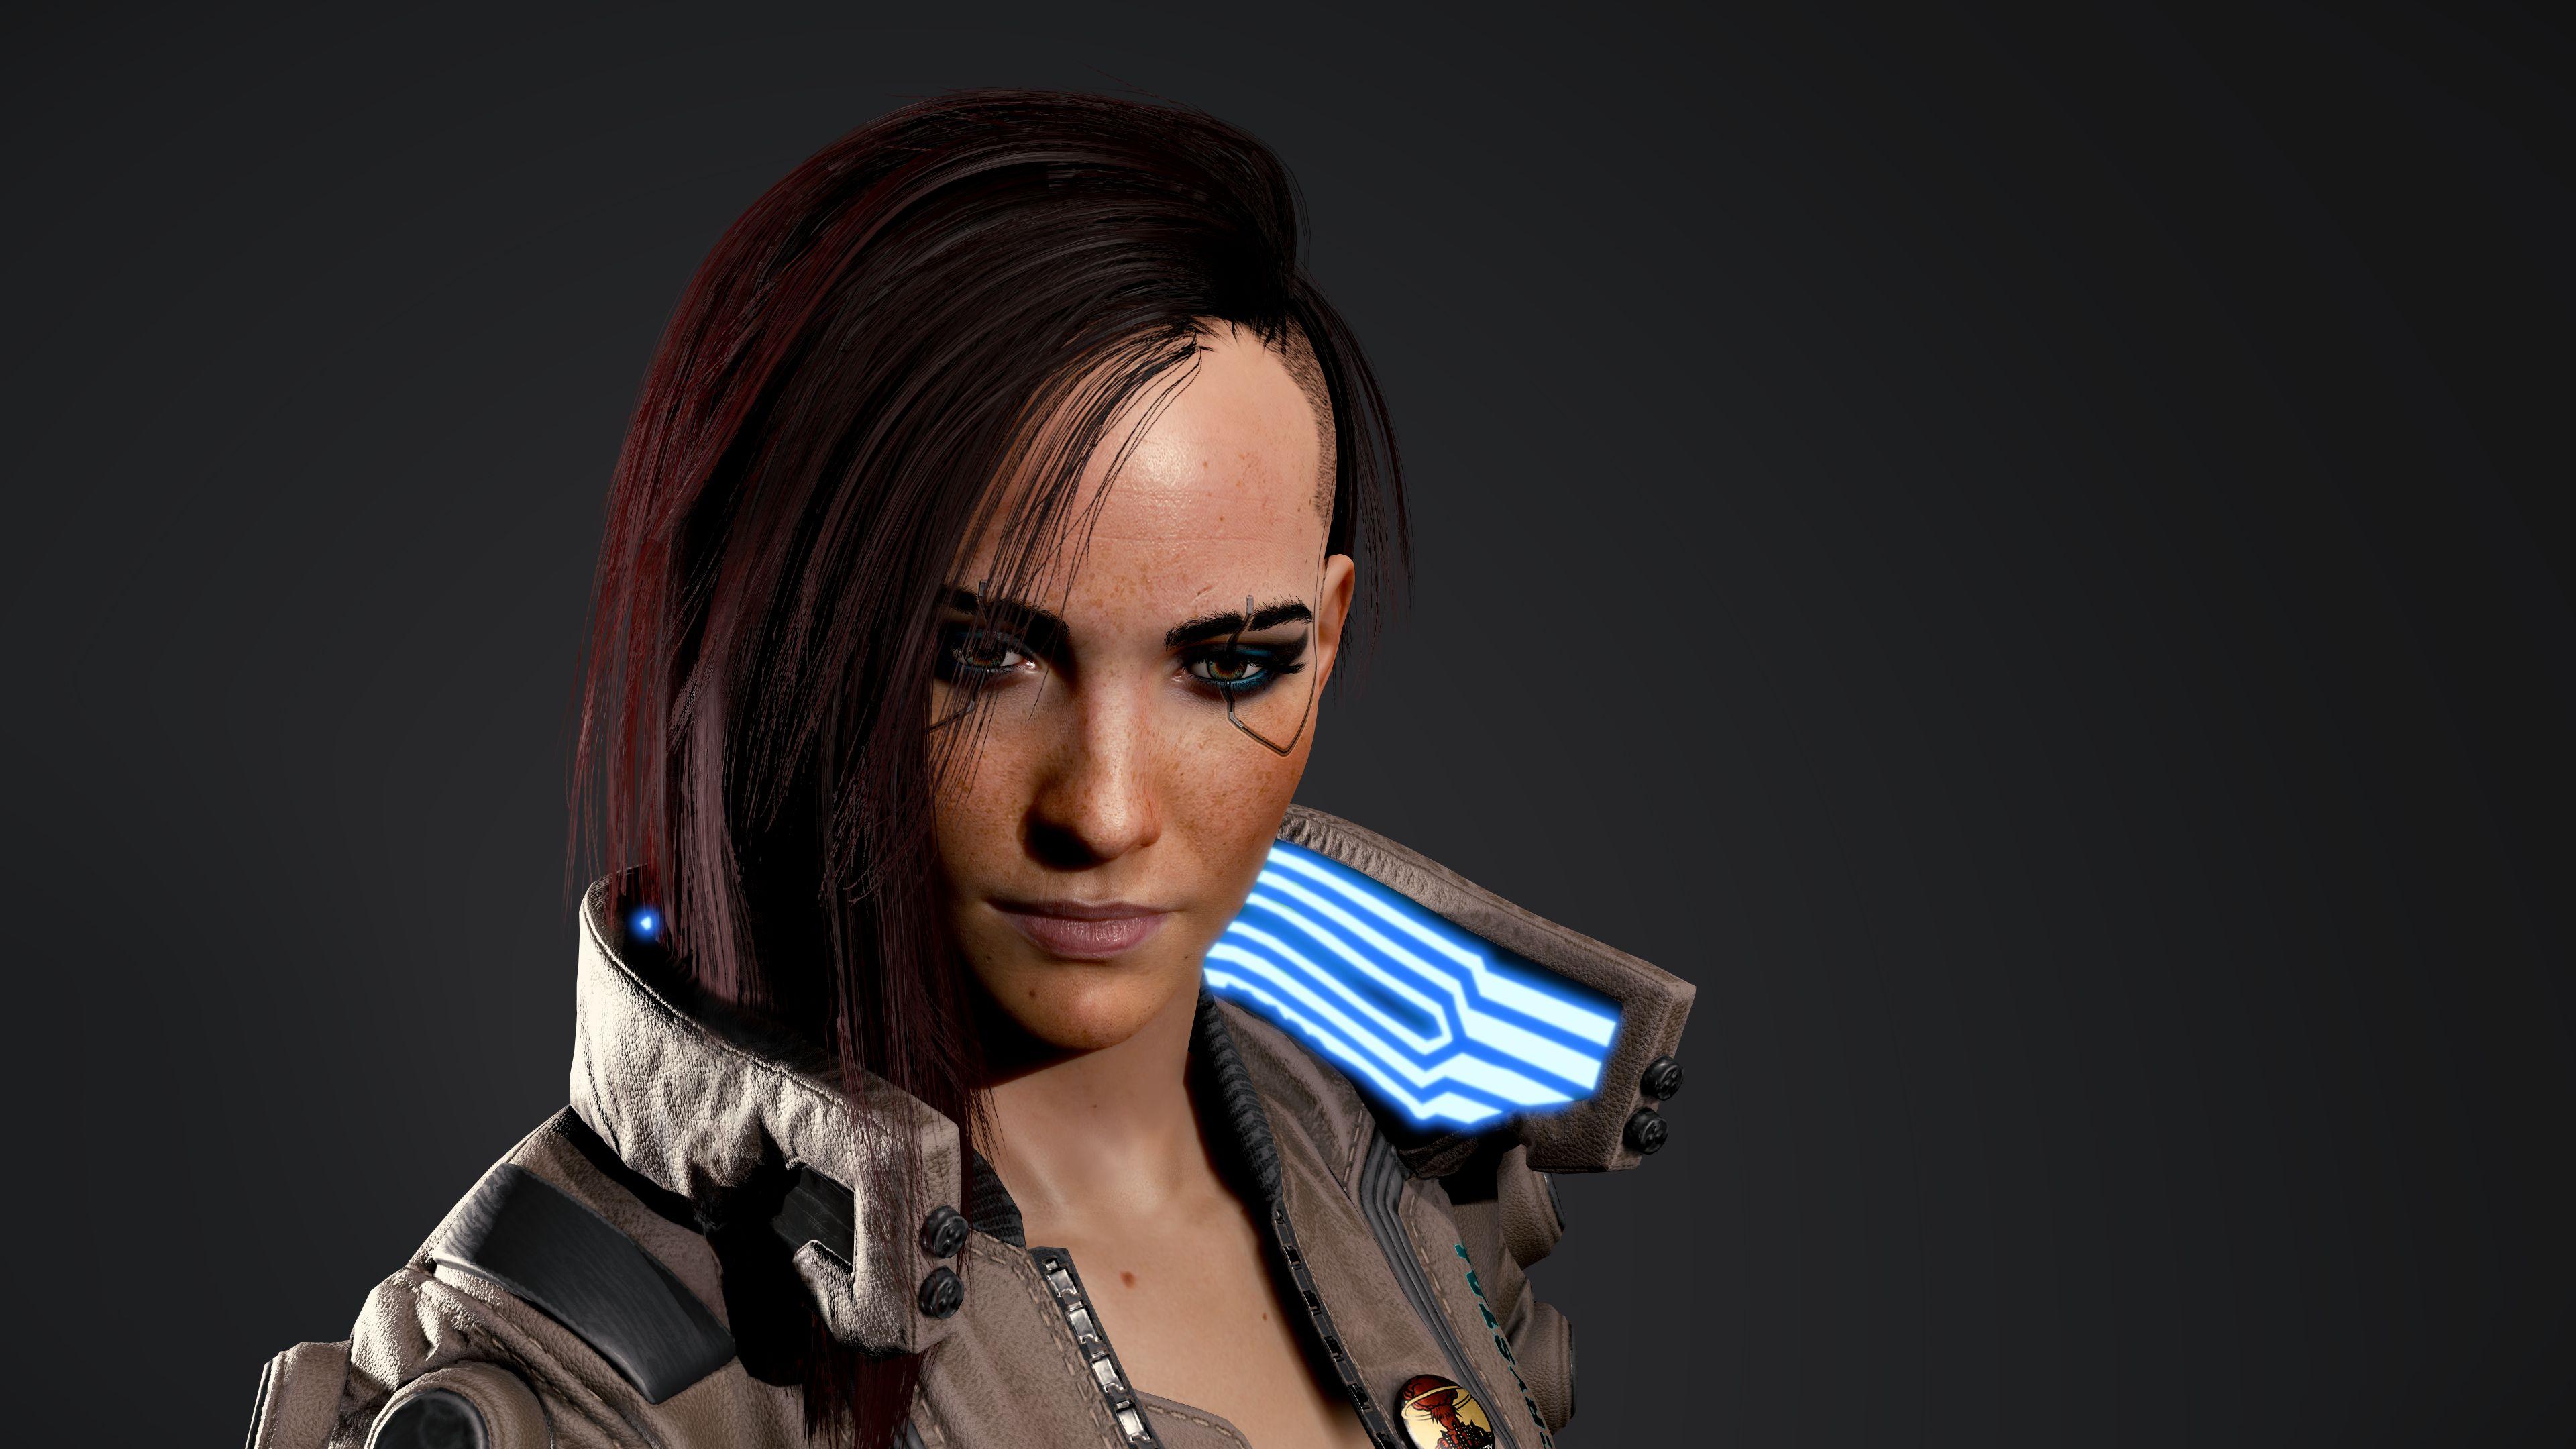 Ви - Cyberpunk 2077